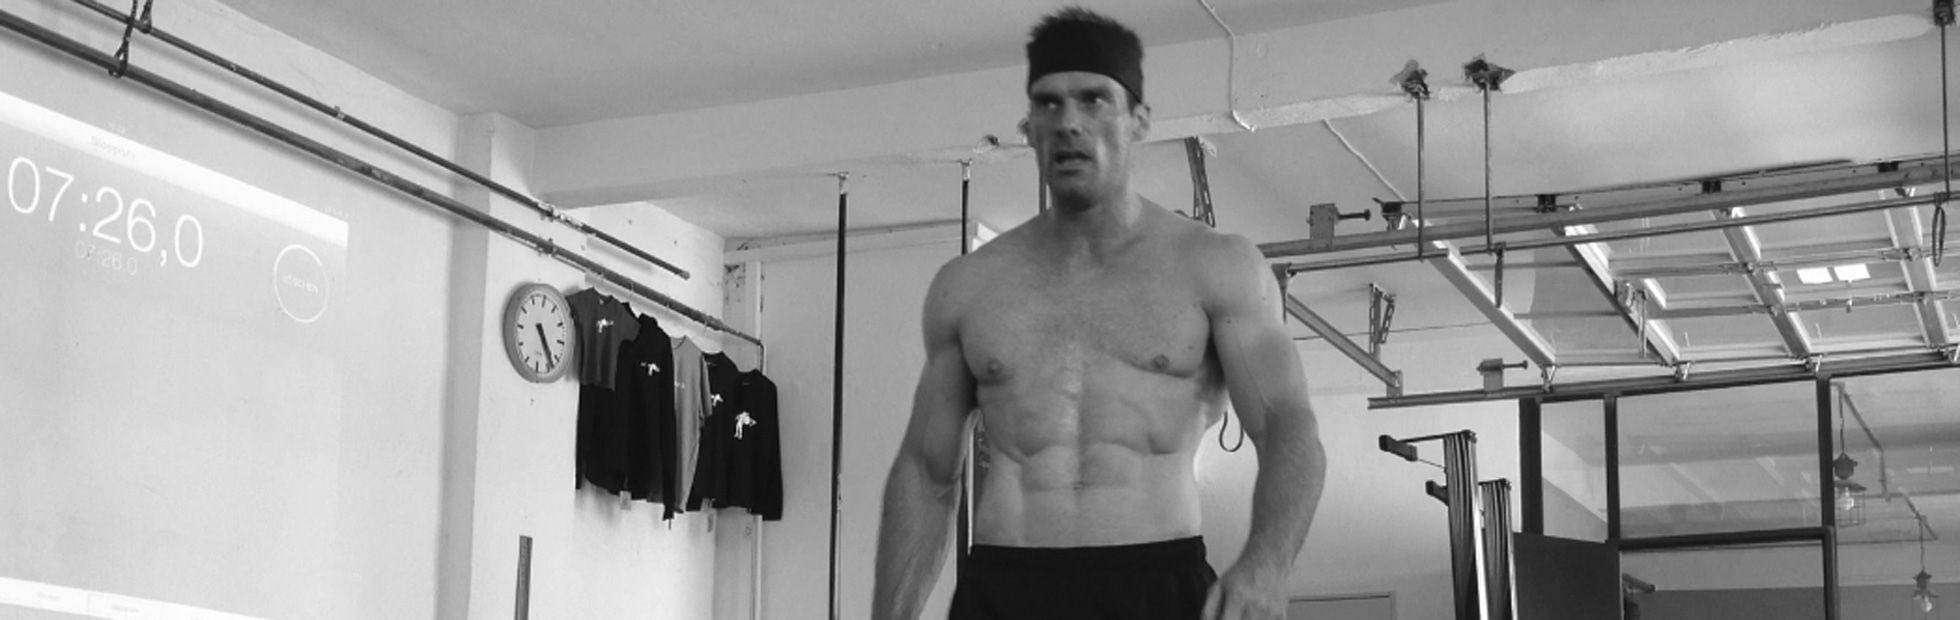 CrossFit Wettkampf-Athlet nach dem WOD